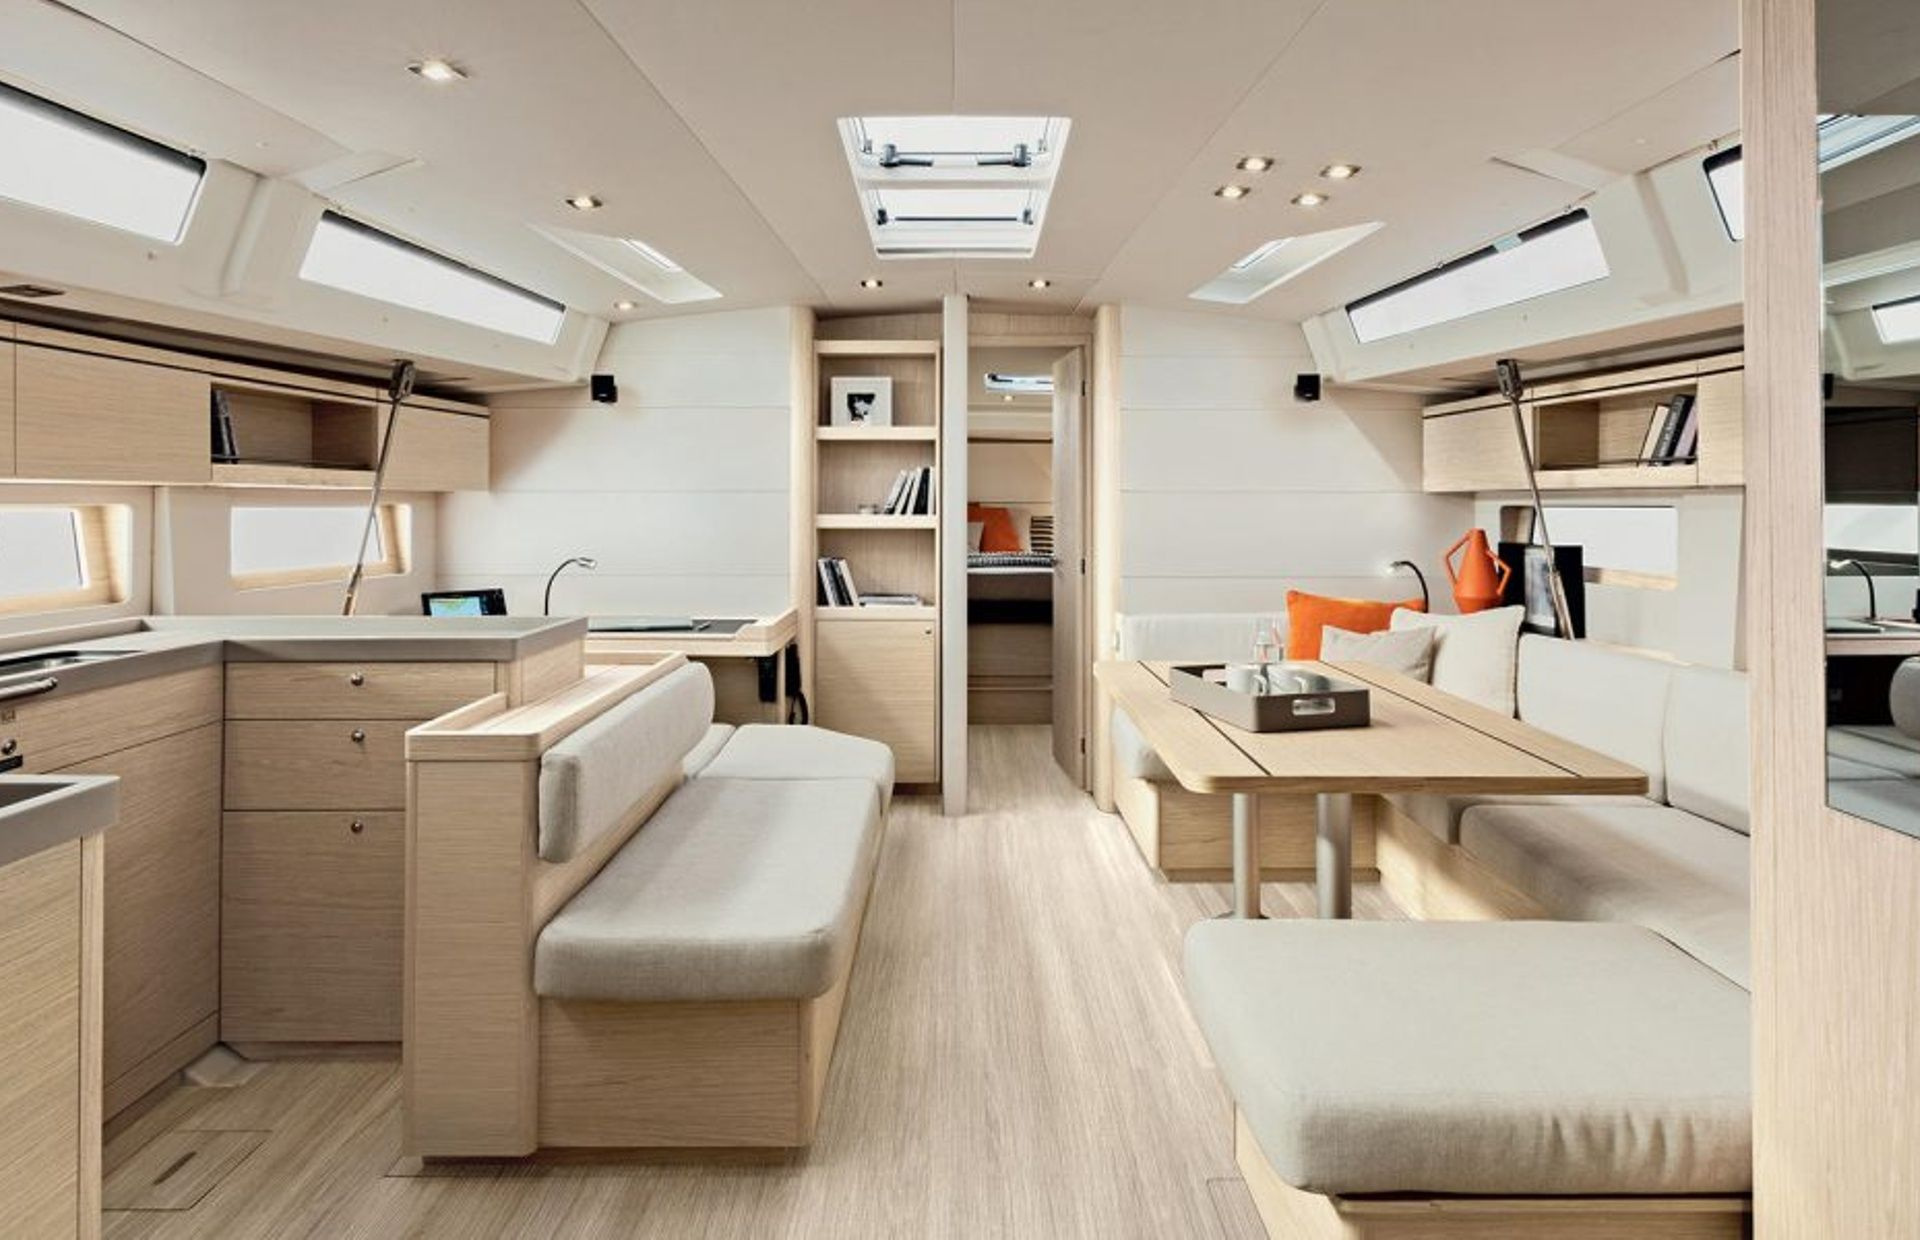 https://media.insailing.com/boat/beneteau-oceanis-51/image_1572277275731.jpg